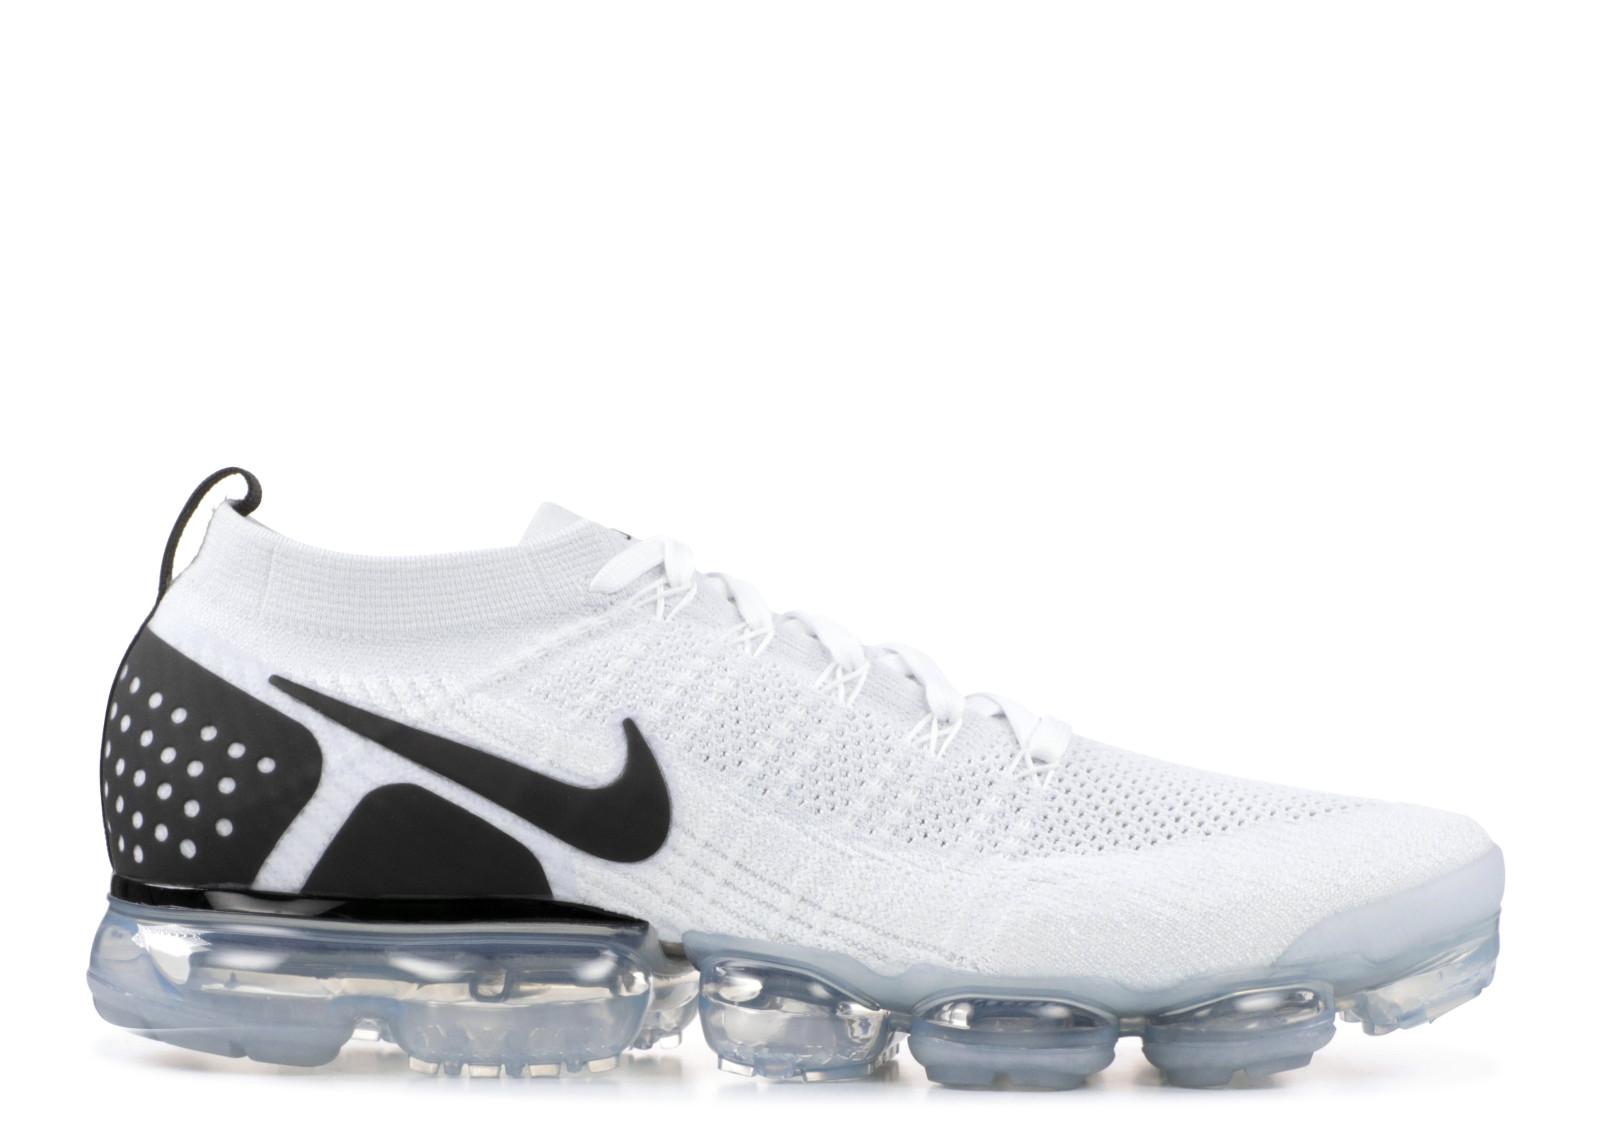 57685380db7f1 Nike Air VaporMax 2 White Black